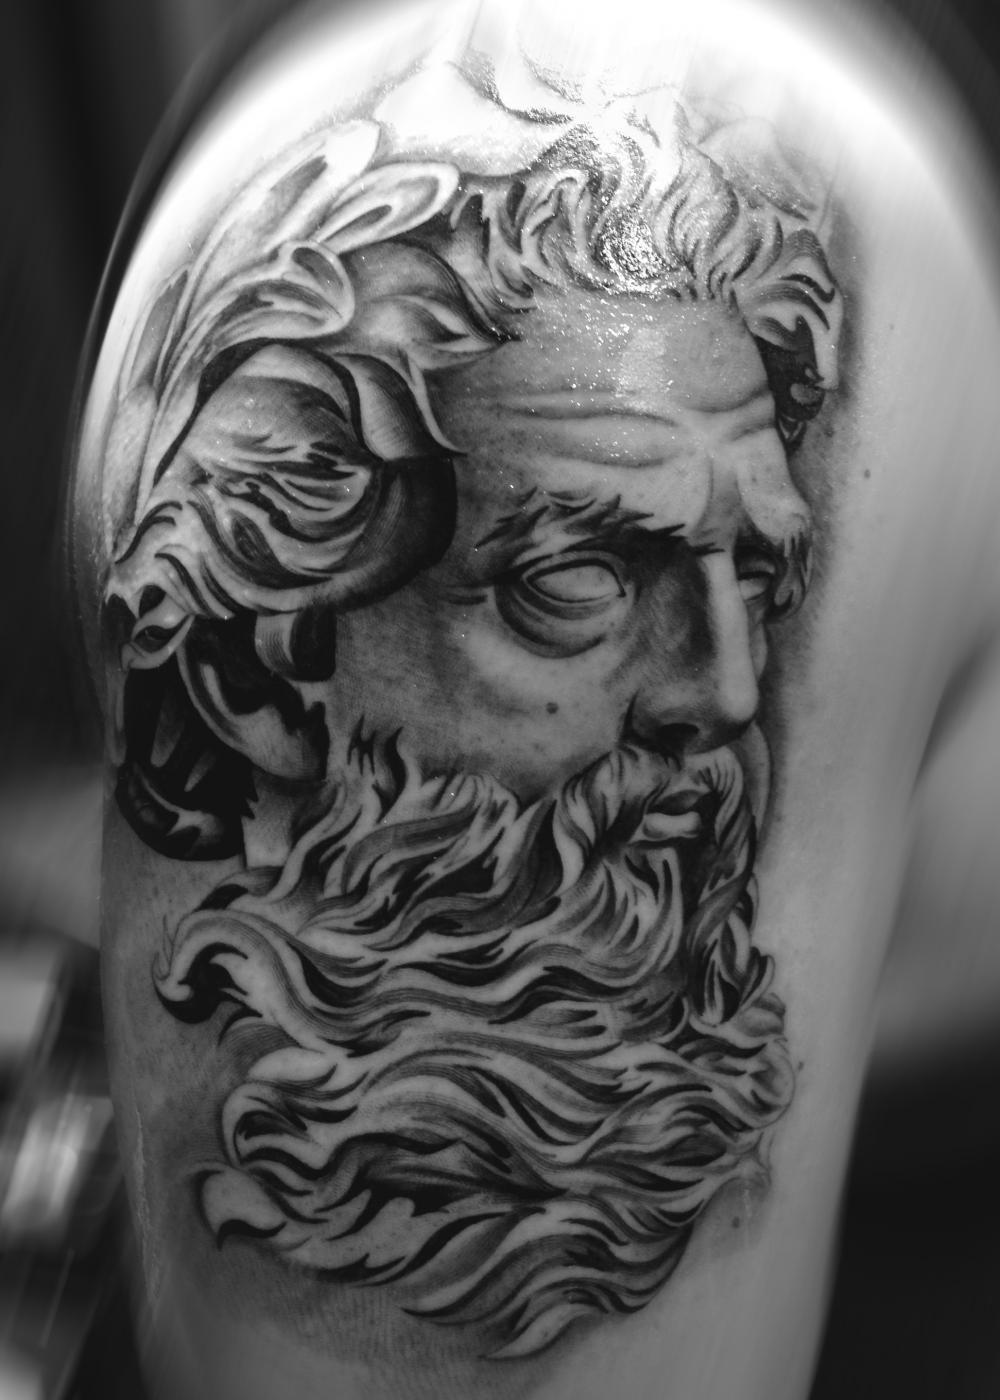 Best tattoo artist in southern california skin arts source